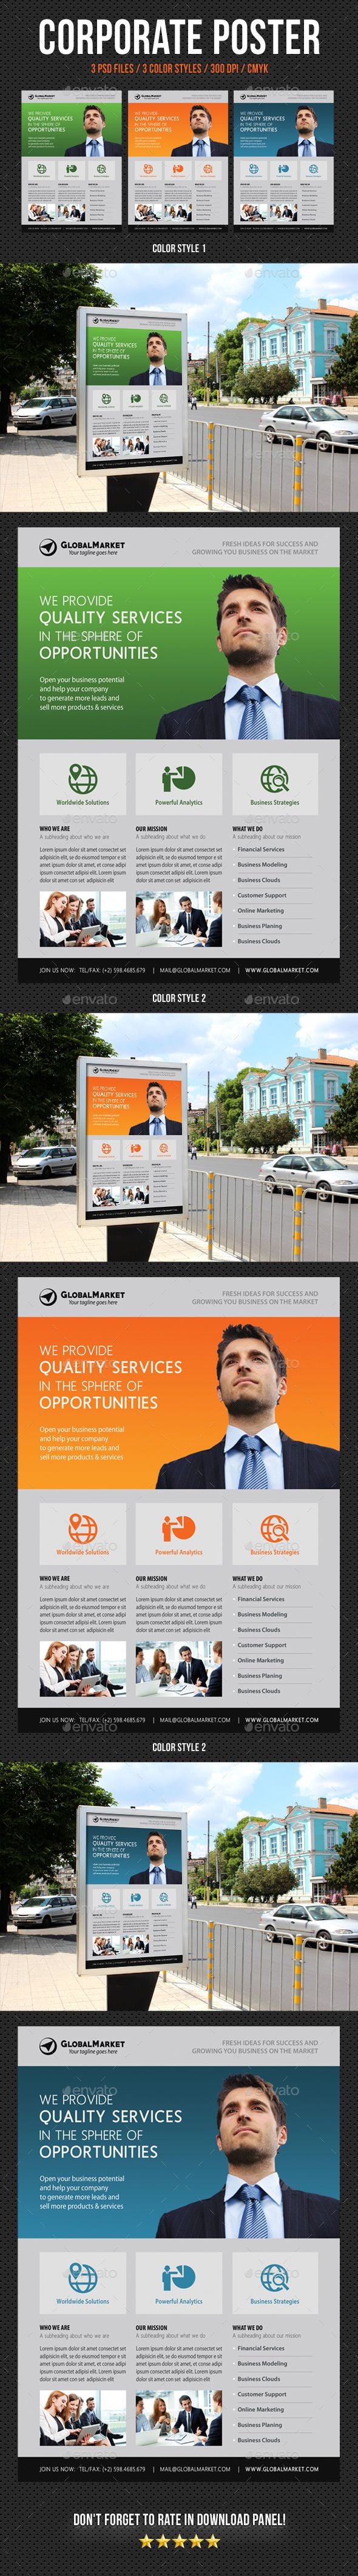 Corporate business poster template v12 business poster corporate corporate business poster template psd friedricerecipe Choice Image